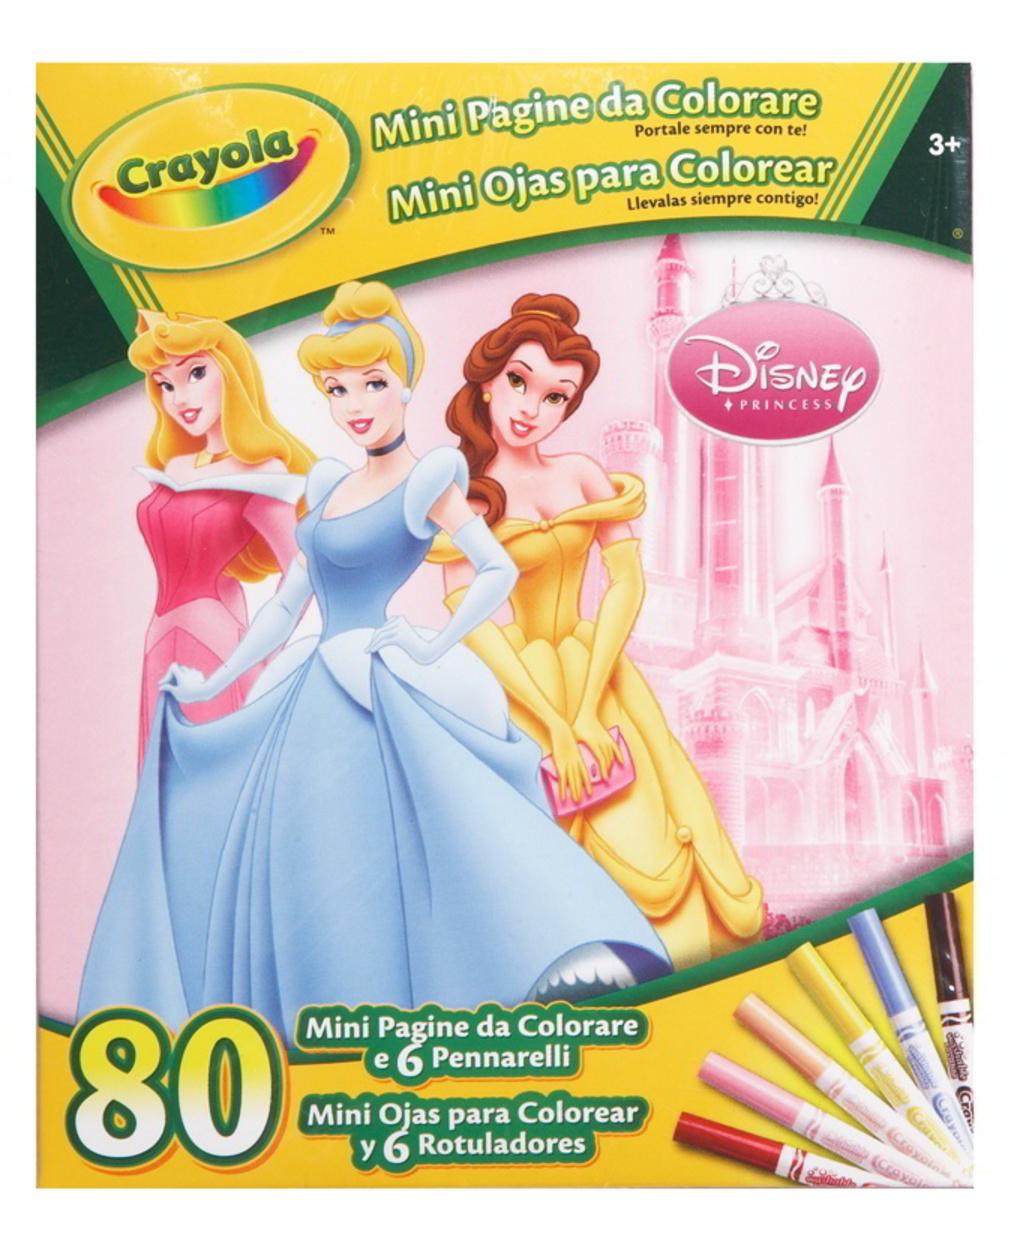 Crayola - mini páginas da disney - Crayola